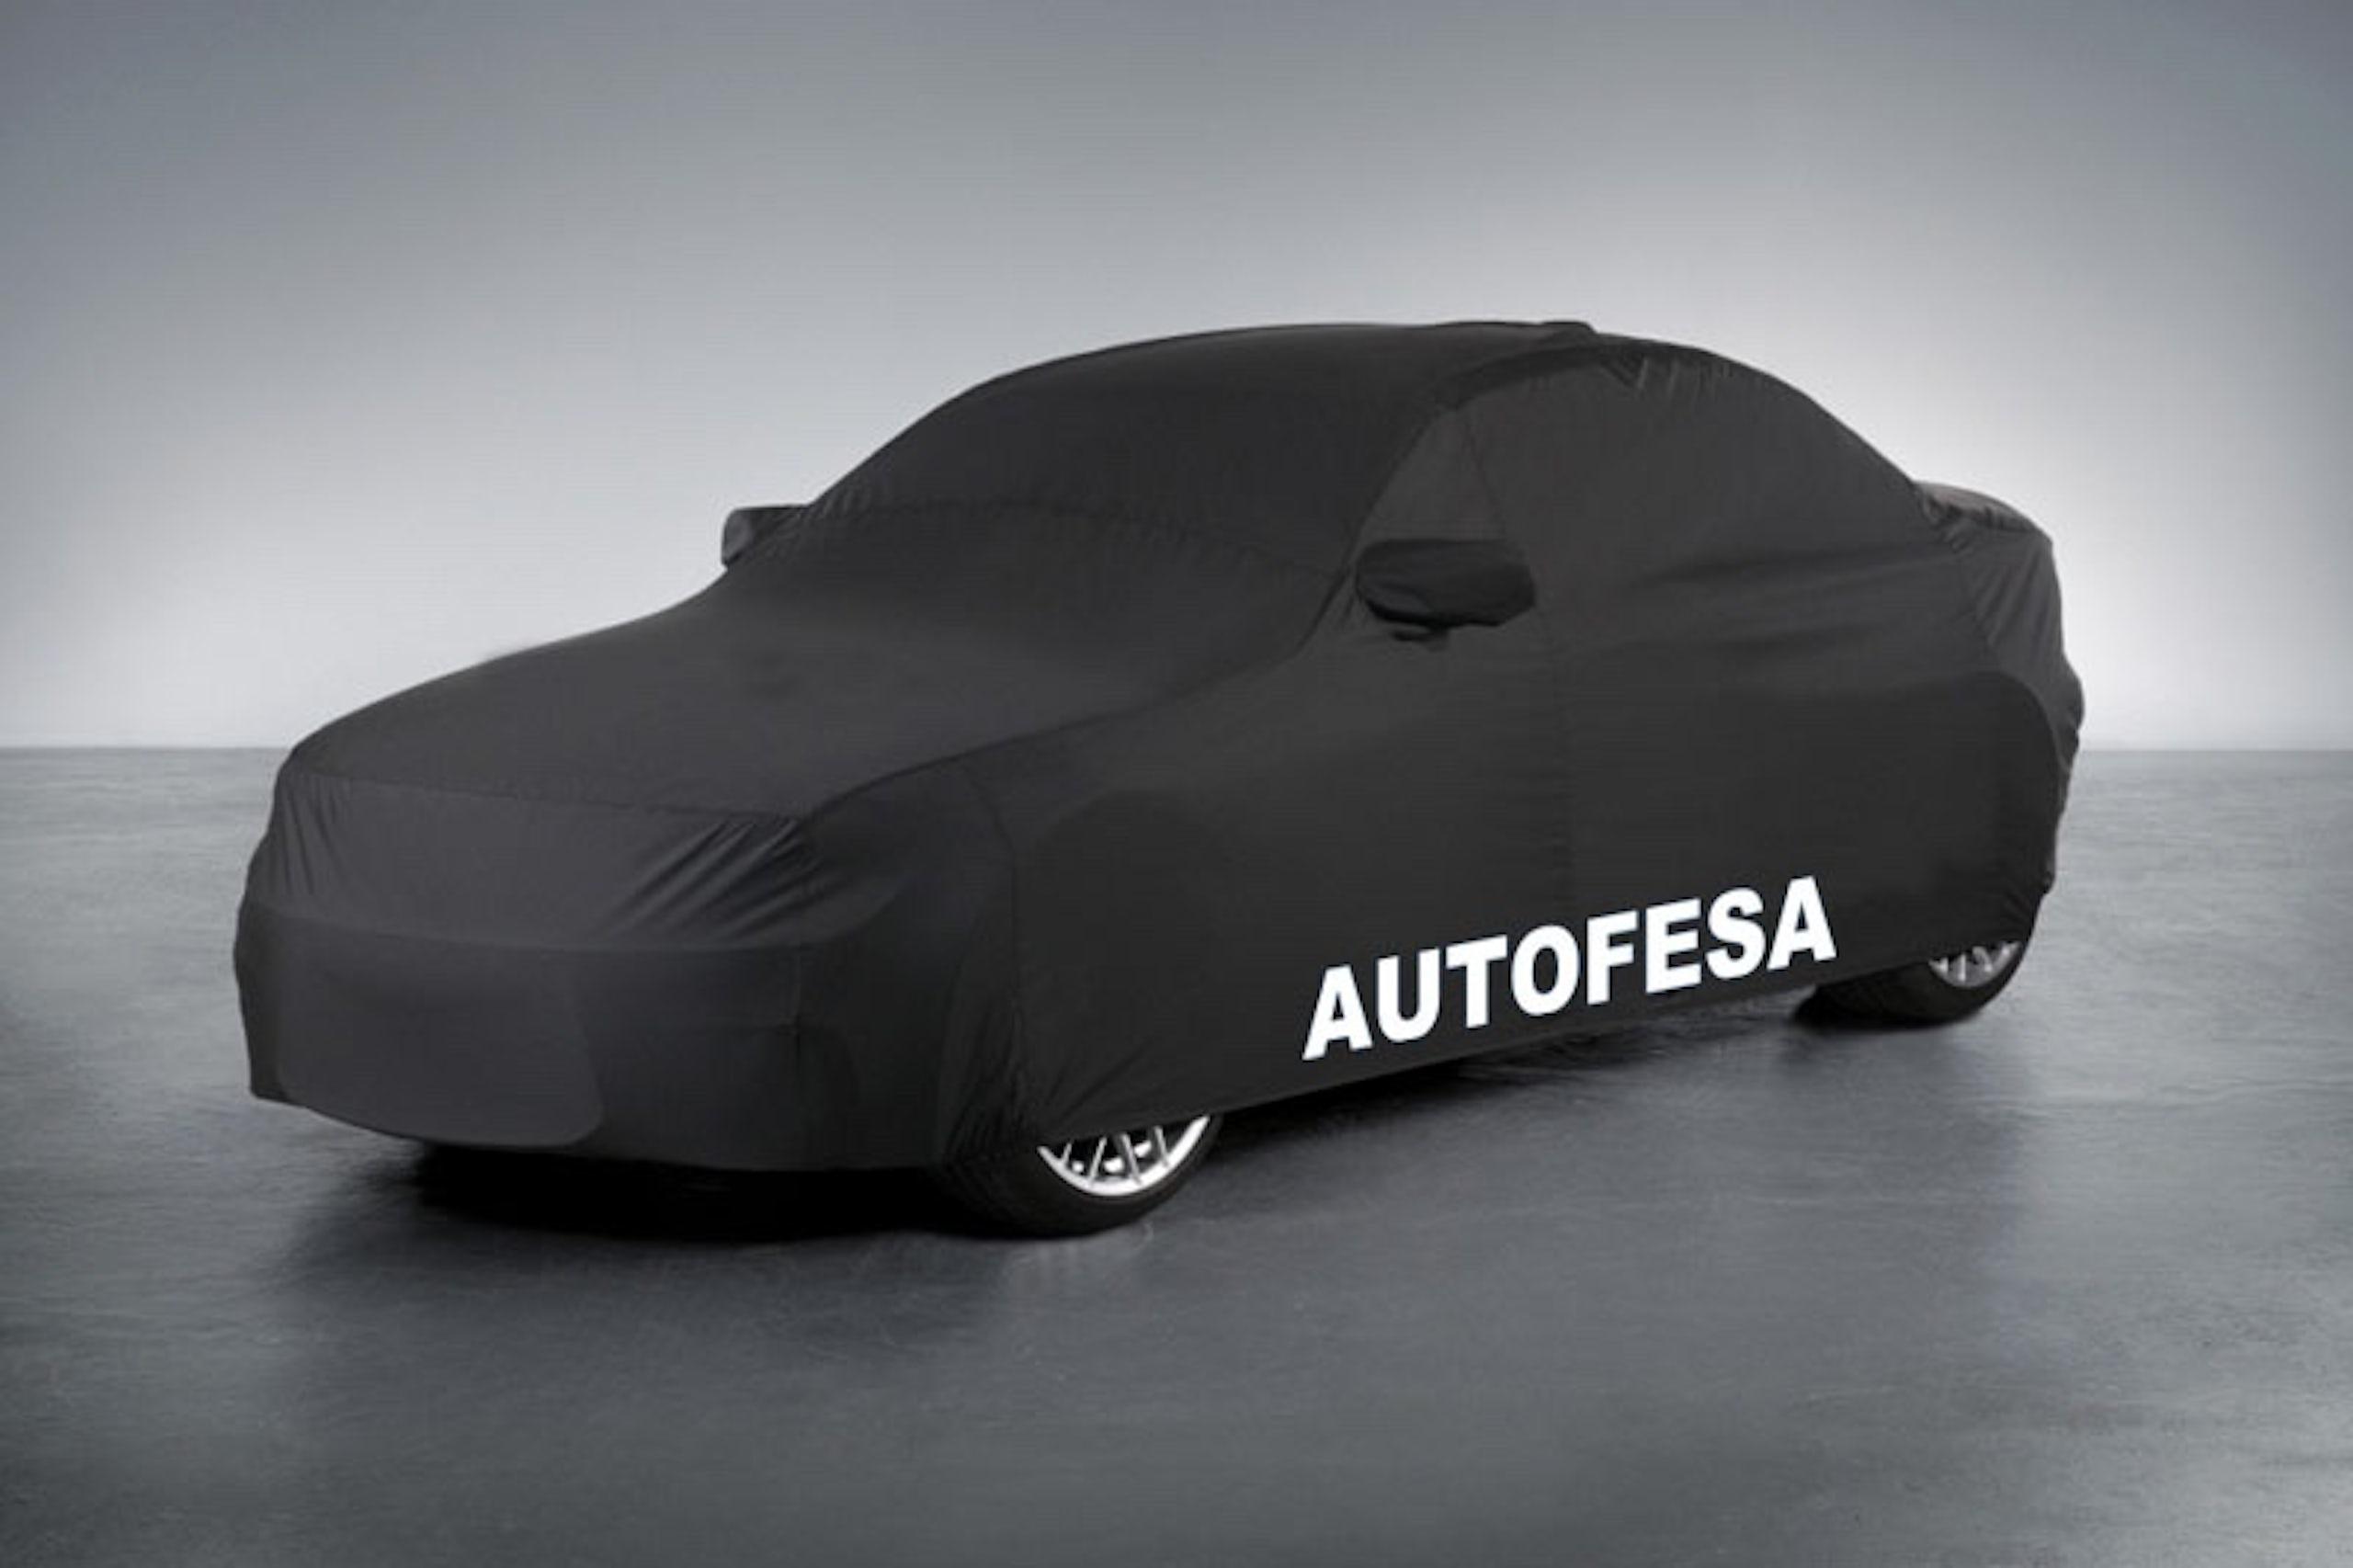 Mitsubishi Outlander 2.0 DI-D 150cv Motion 2WD 5p 7plz Auto S/S - Foto 15